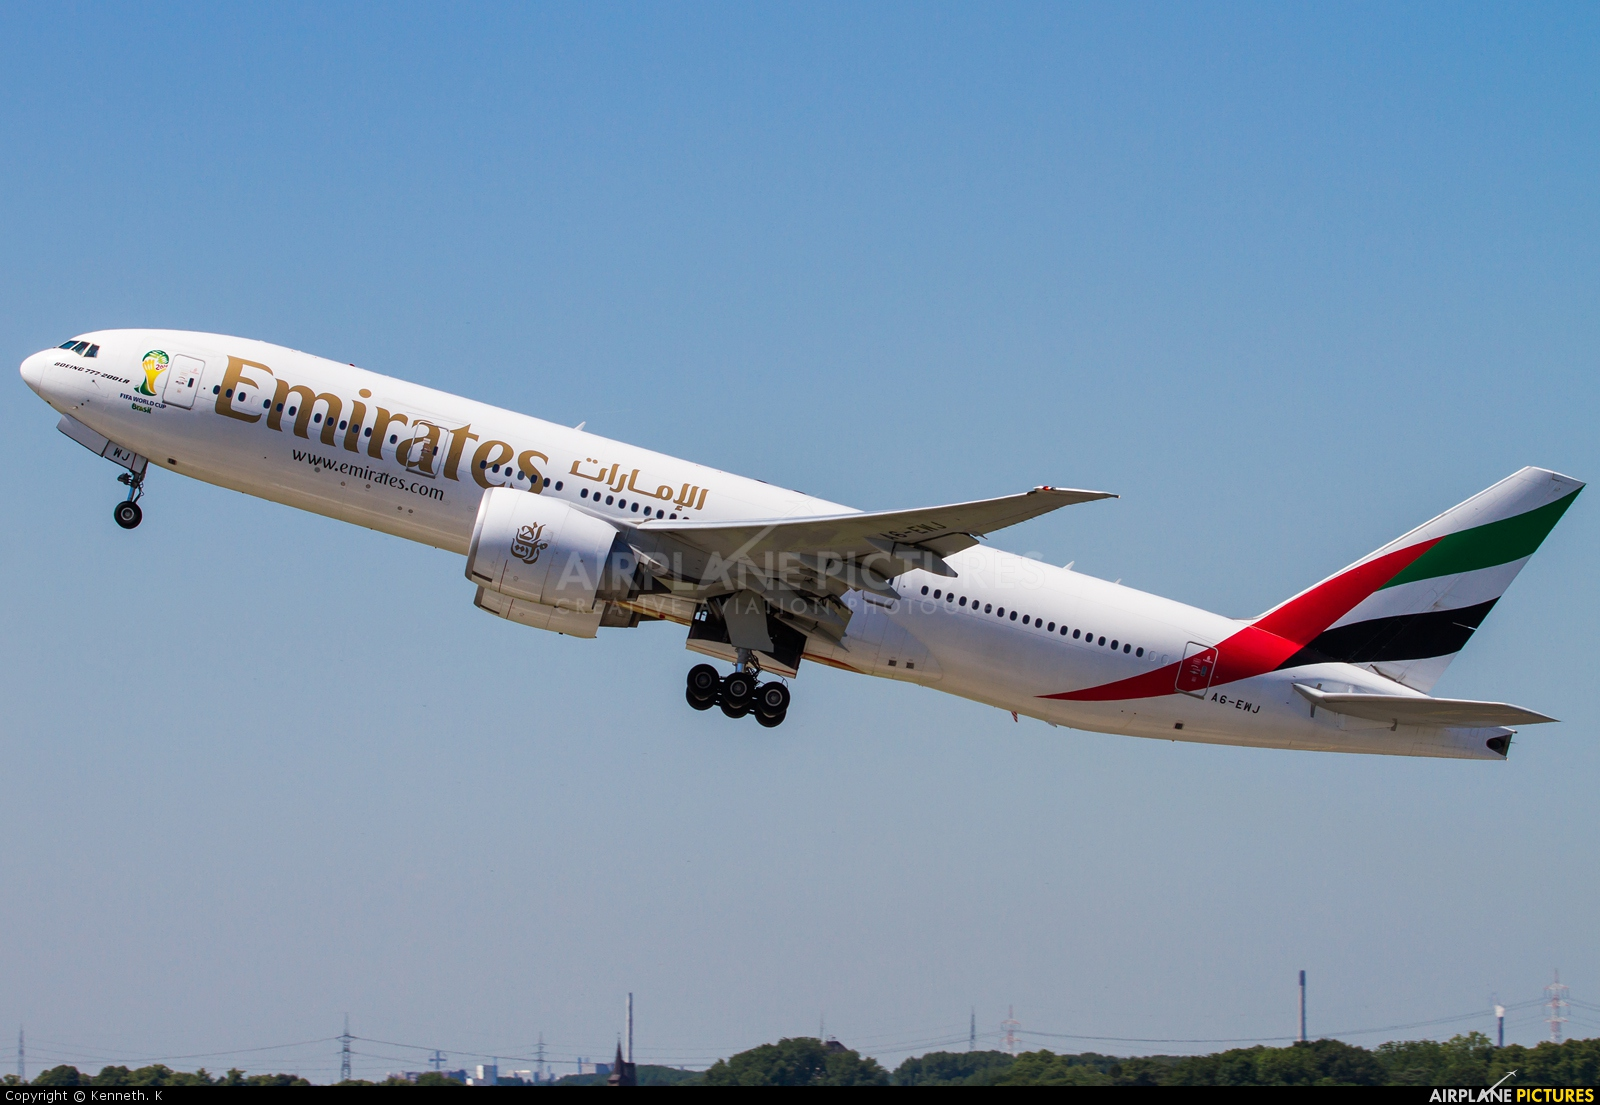 Emirates Airlines A6-EWJ aircraft at Düsseldorf